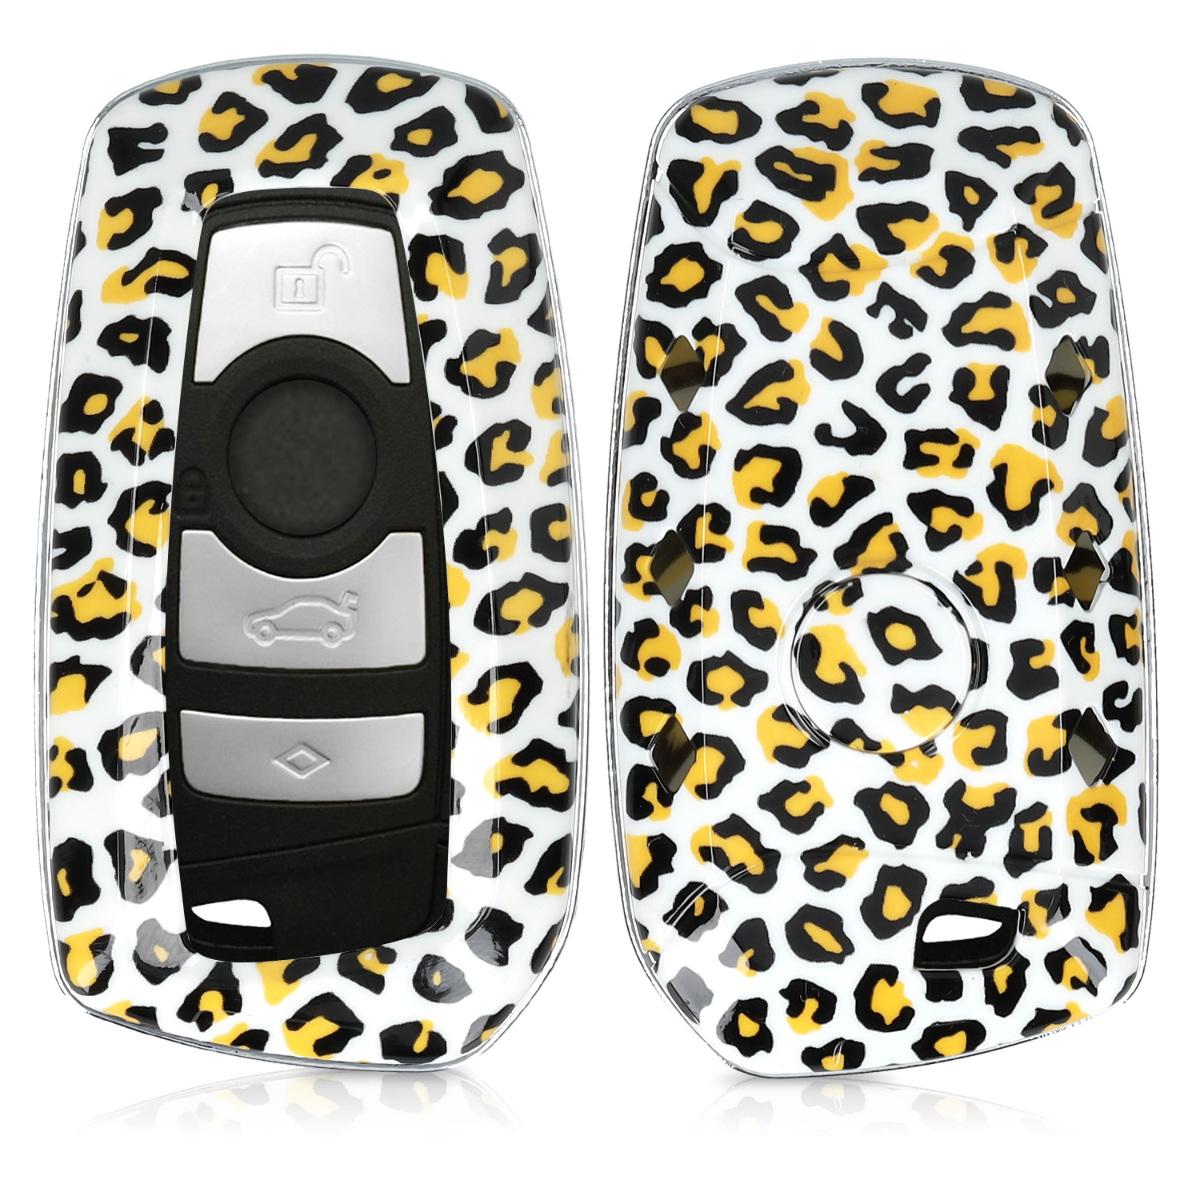 KW Σκληρή Θήκη Κλειδιού BMW - 3 Κουμπιά - Keyless Go - Black / Yellow / White (47859.03)